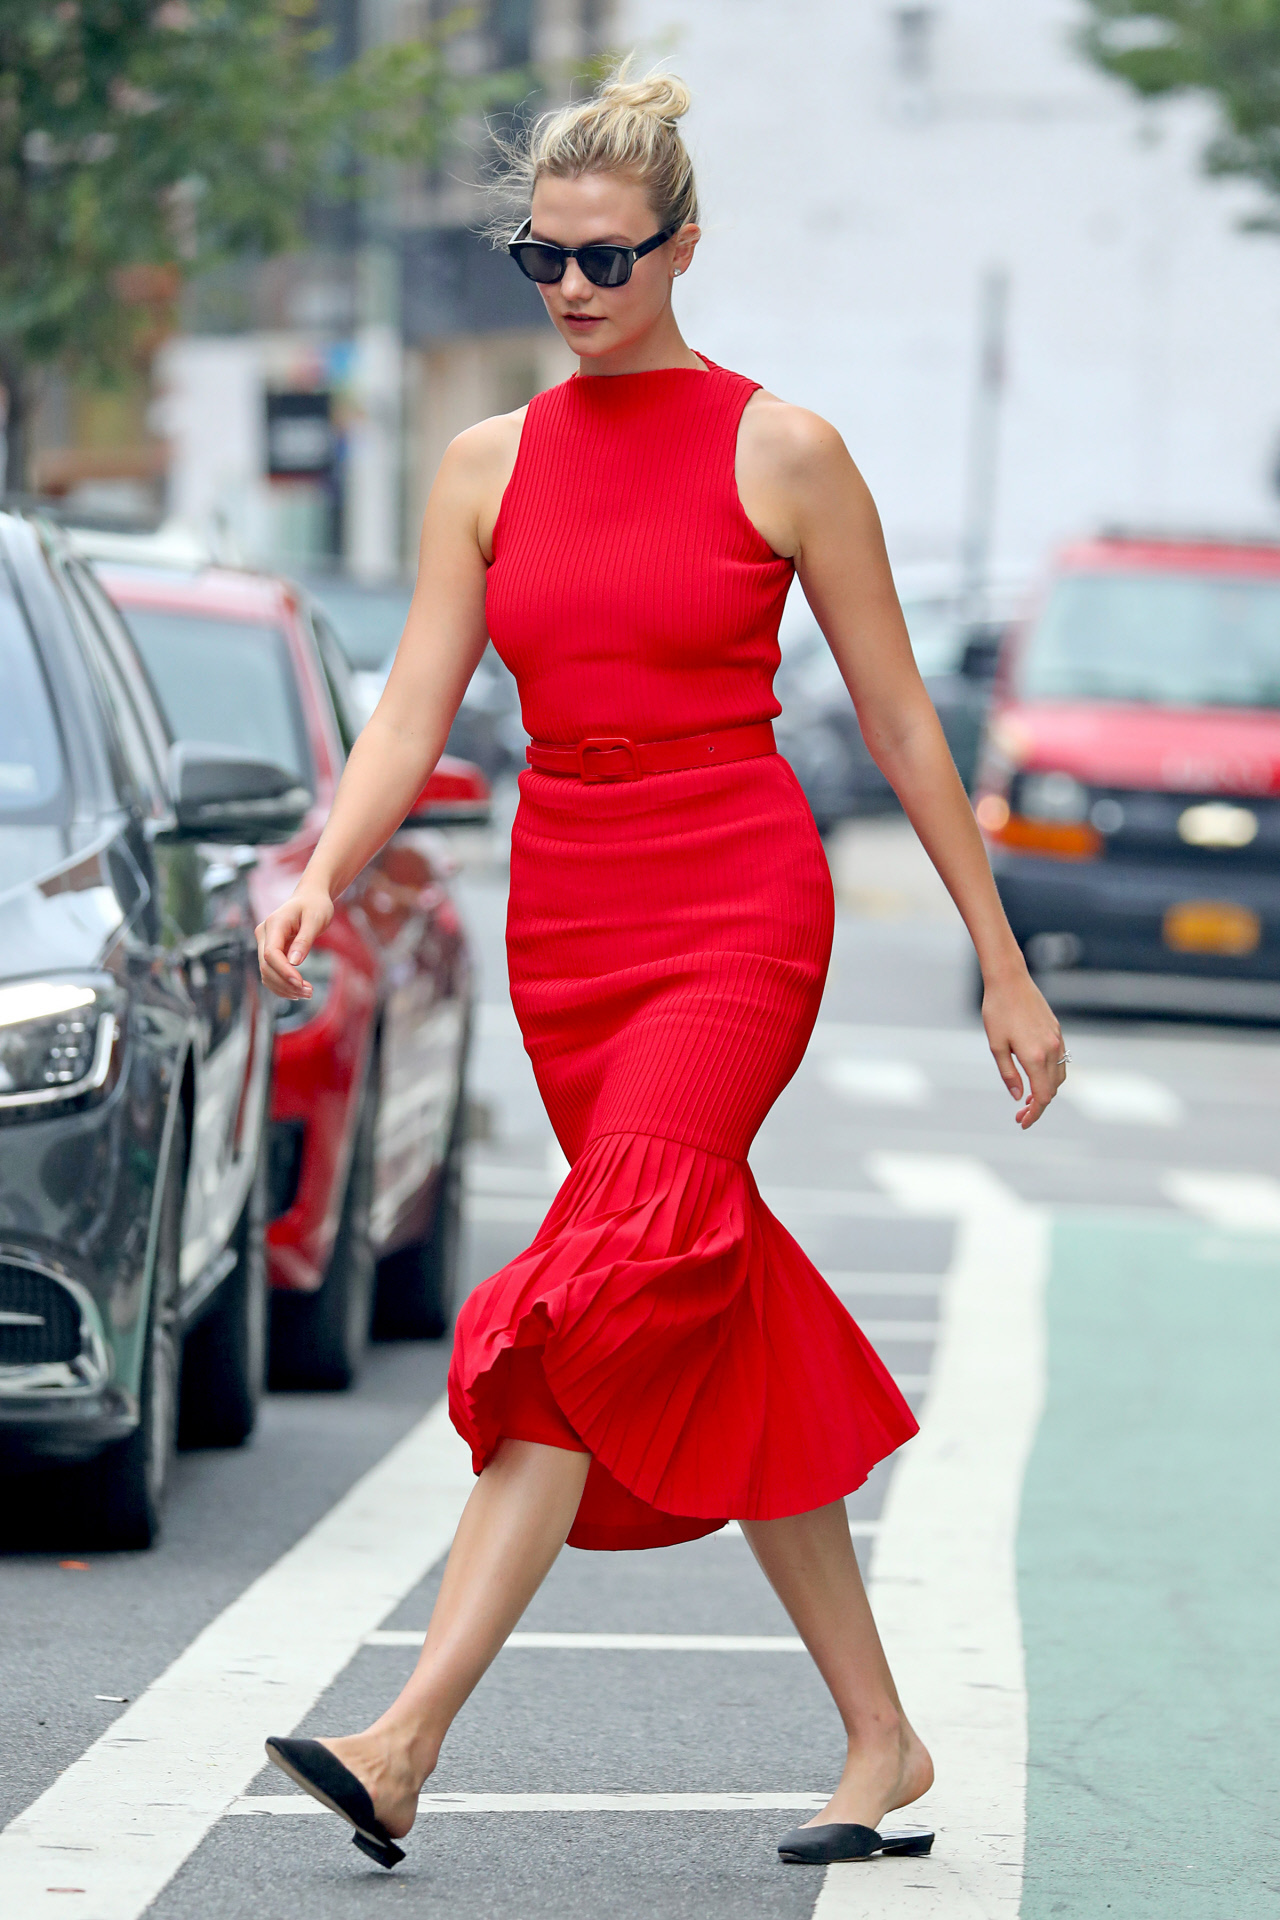 Karlie Kloss consigue un look ganador gracias a prendas básicas